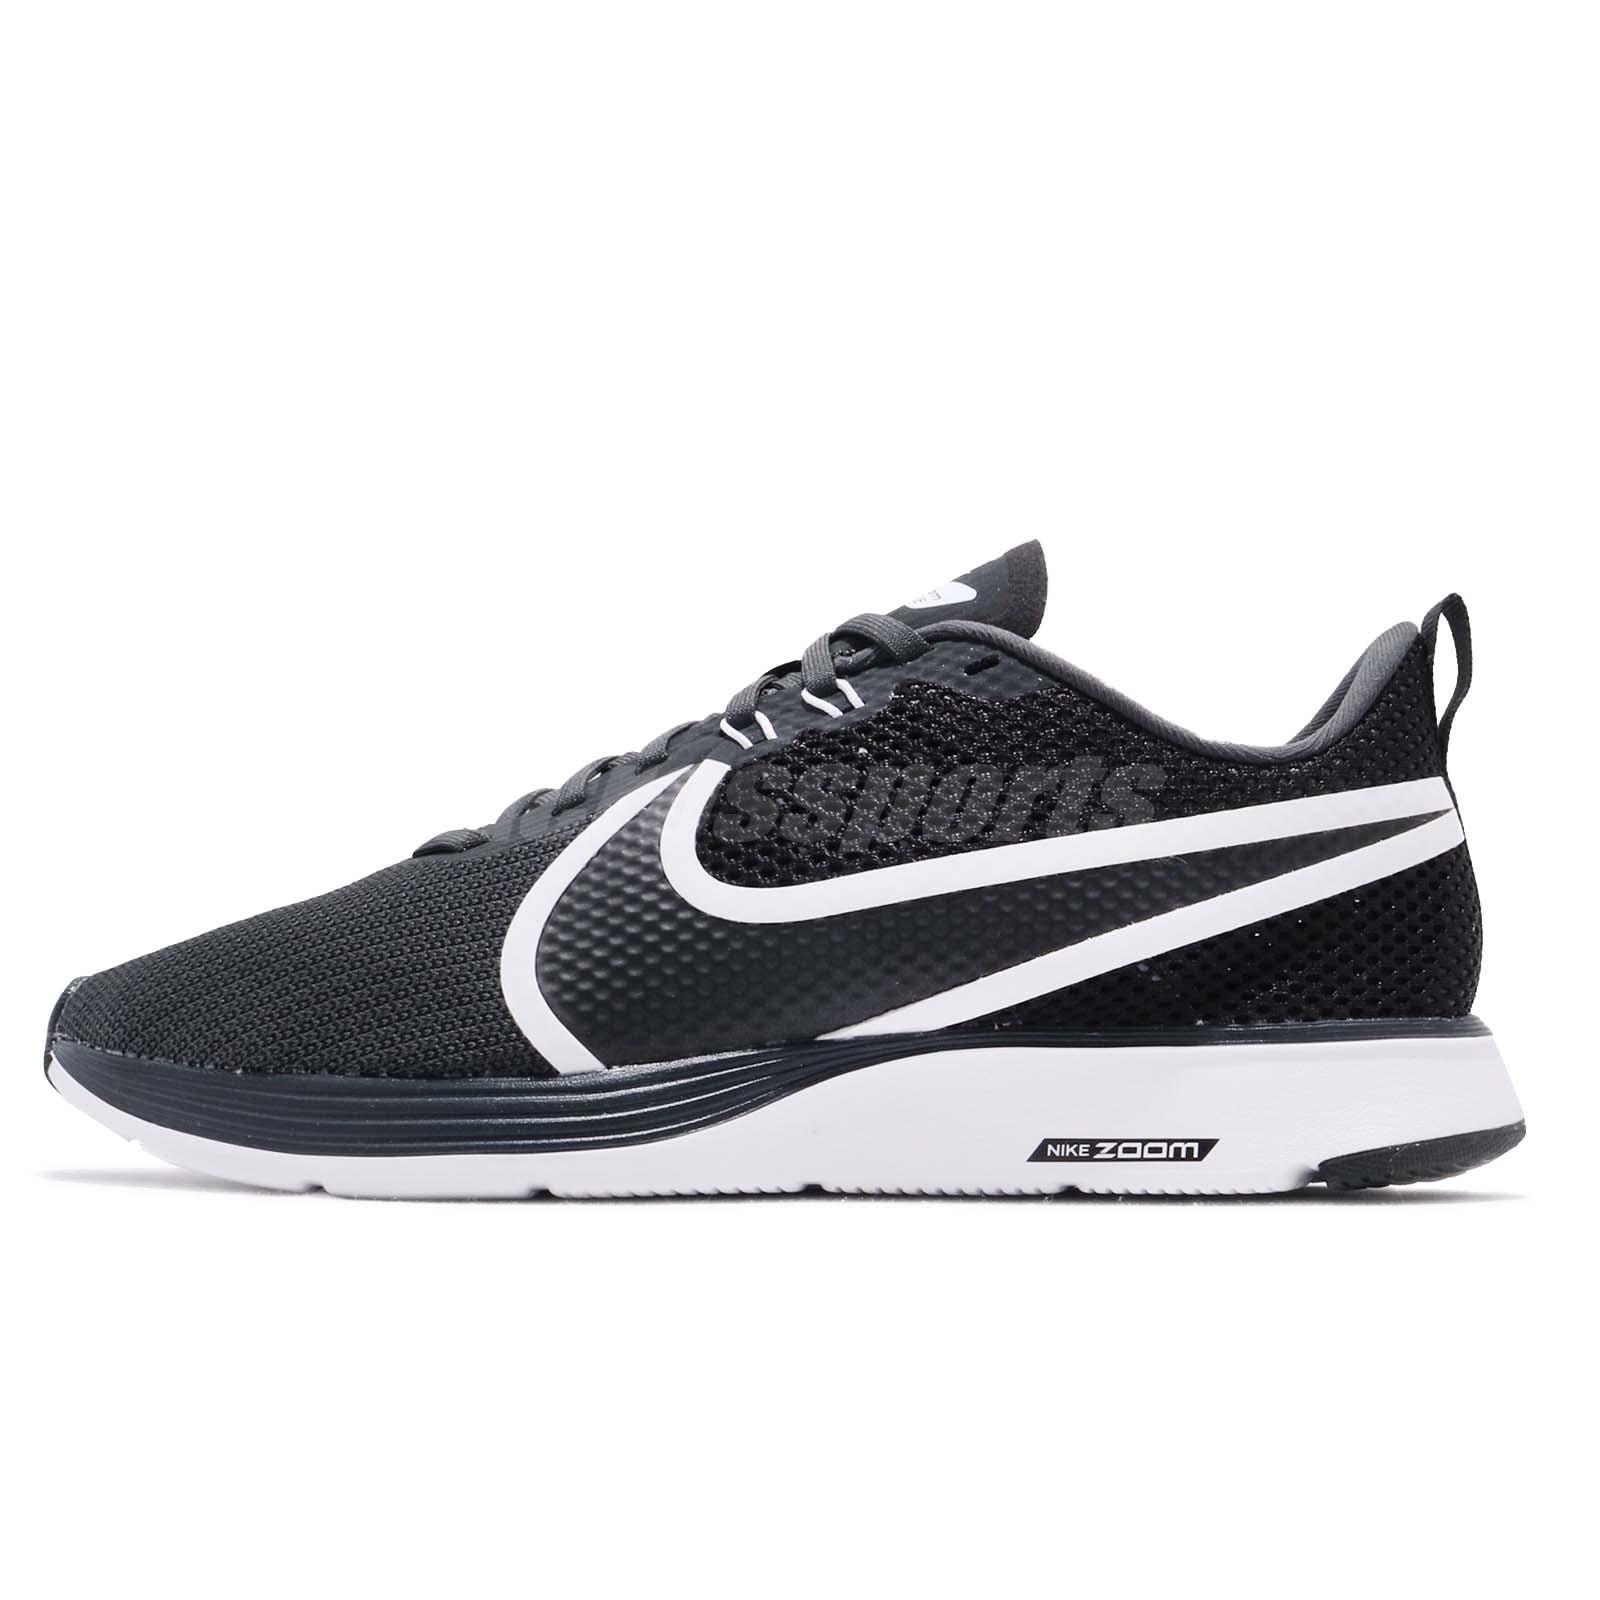 db8316c1f06fc Nike Zoom Strike 2 Black White Men Running Training Shoes Sneakers AO1912- 001